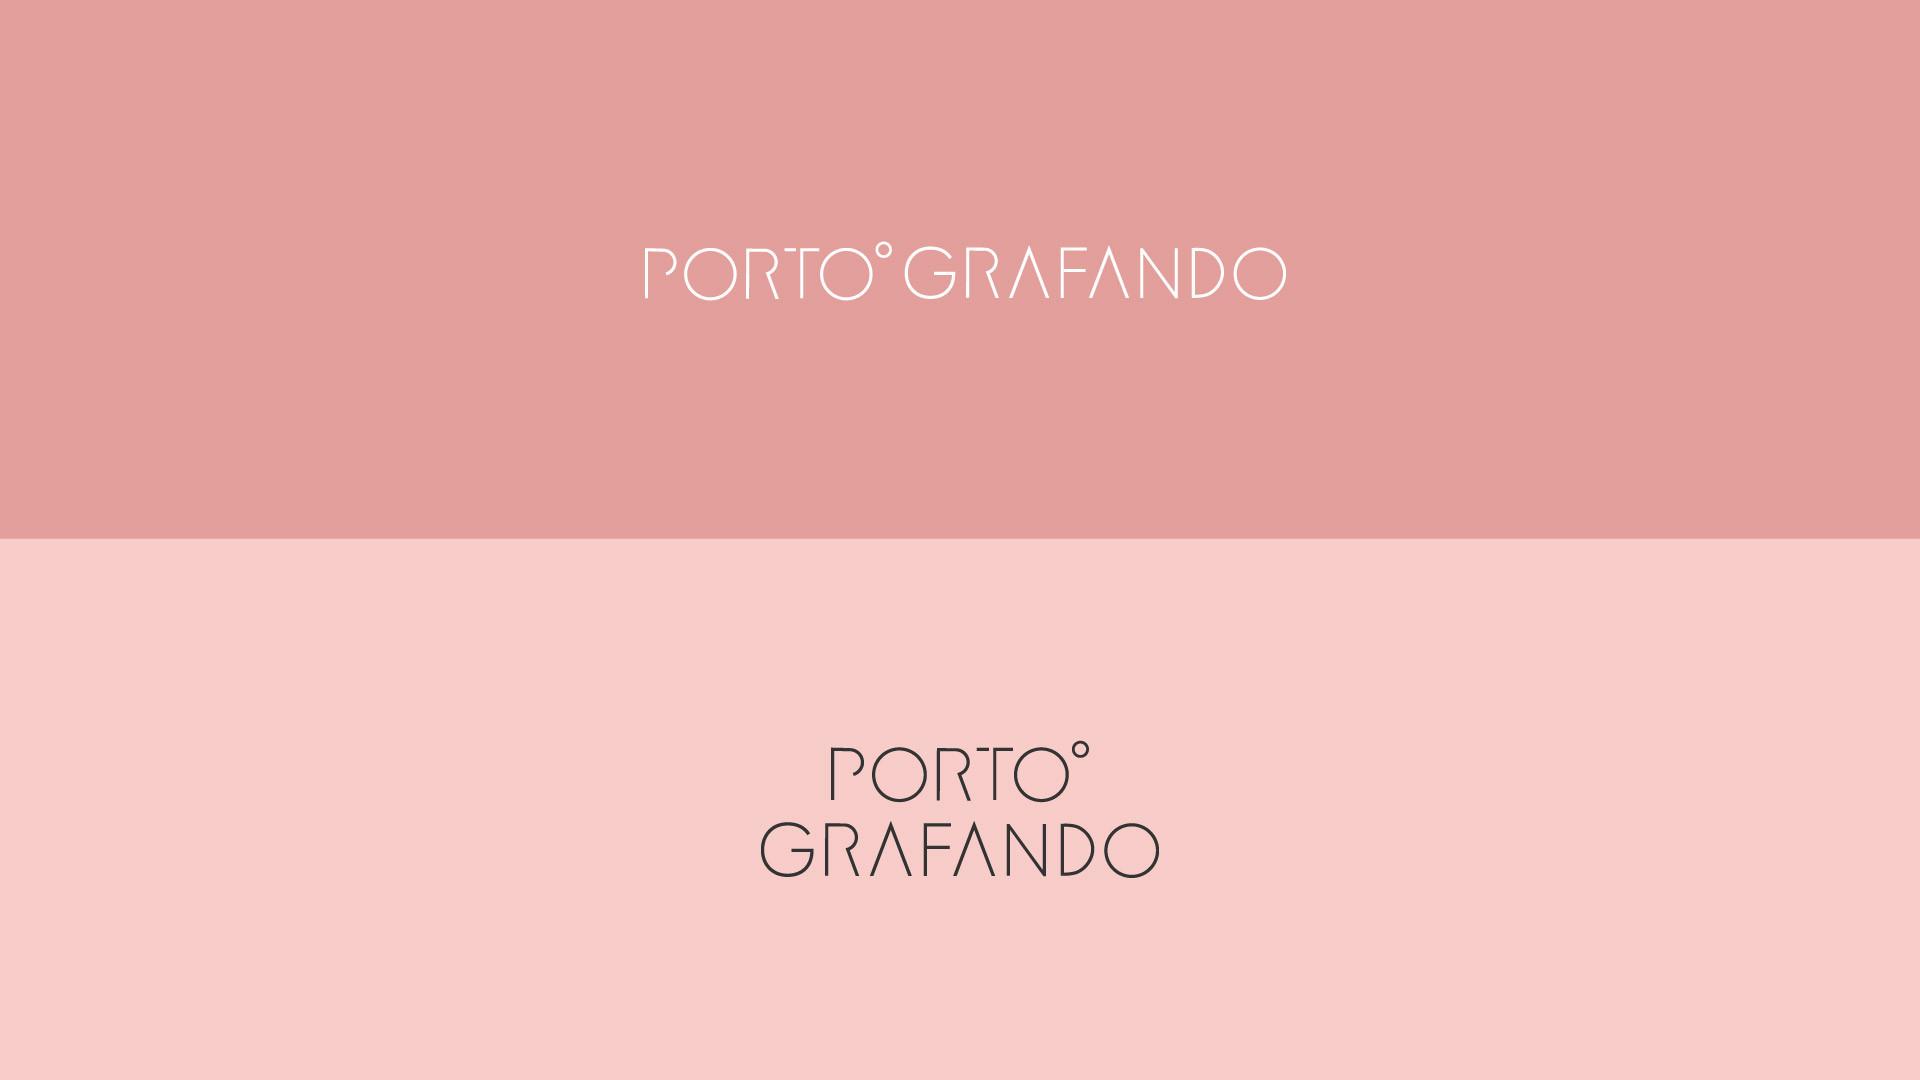 Portografando - Mockups (site)_09.jpg